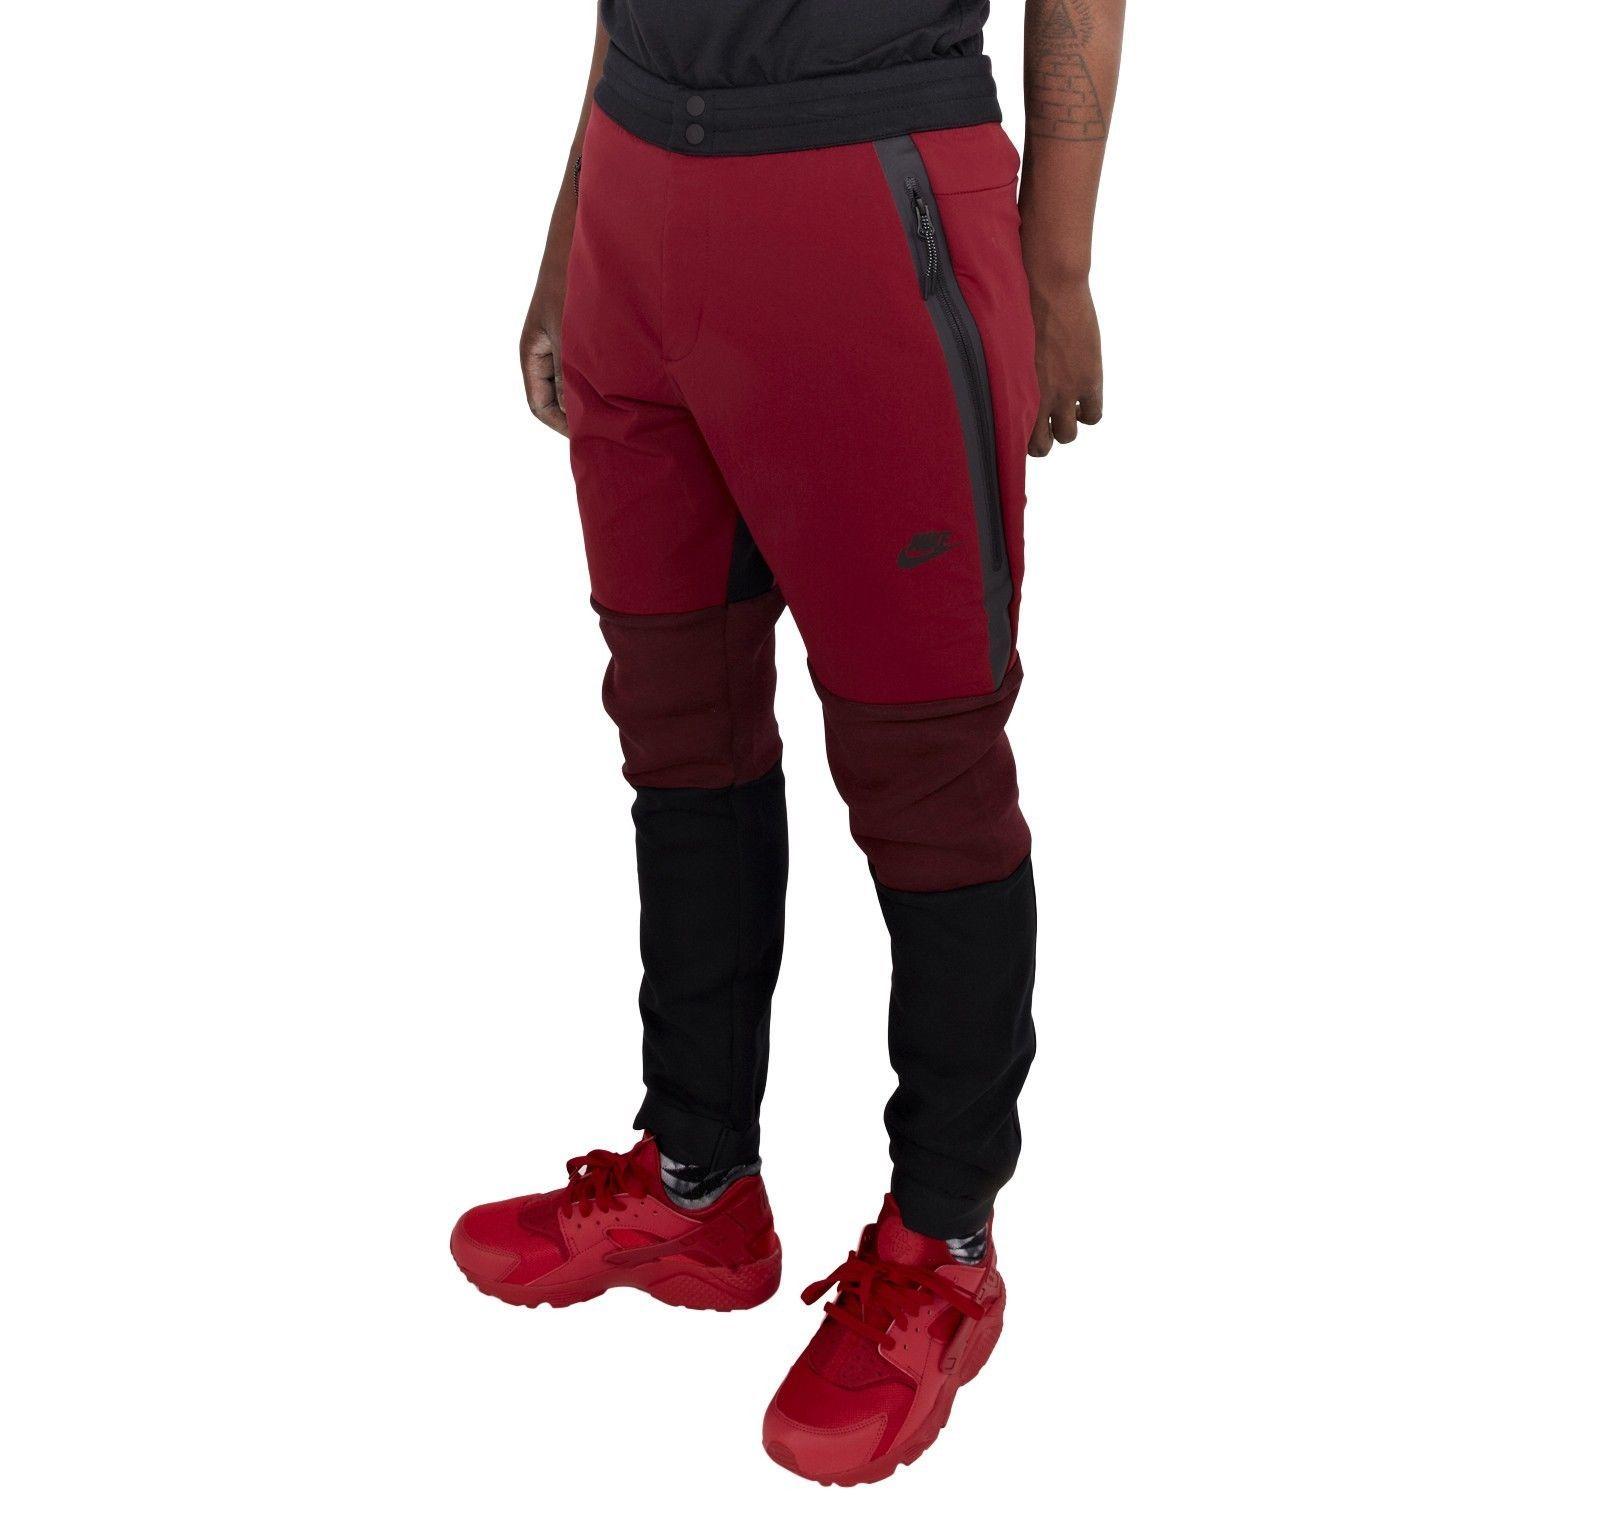 Nike tech fleece red black cargo jogger pants 700769 657